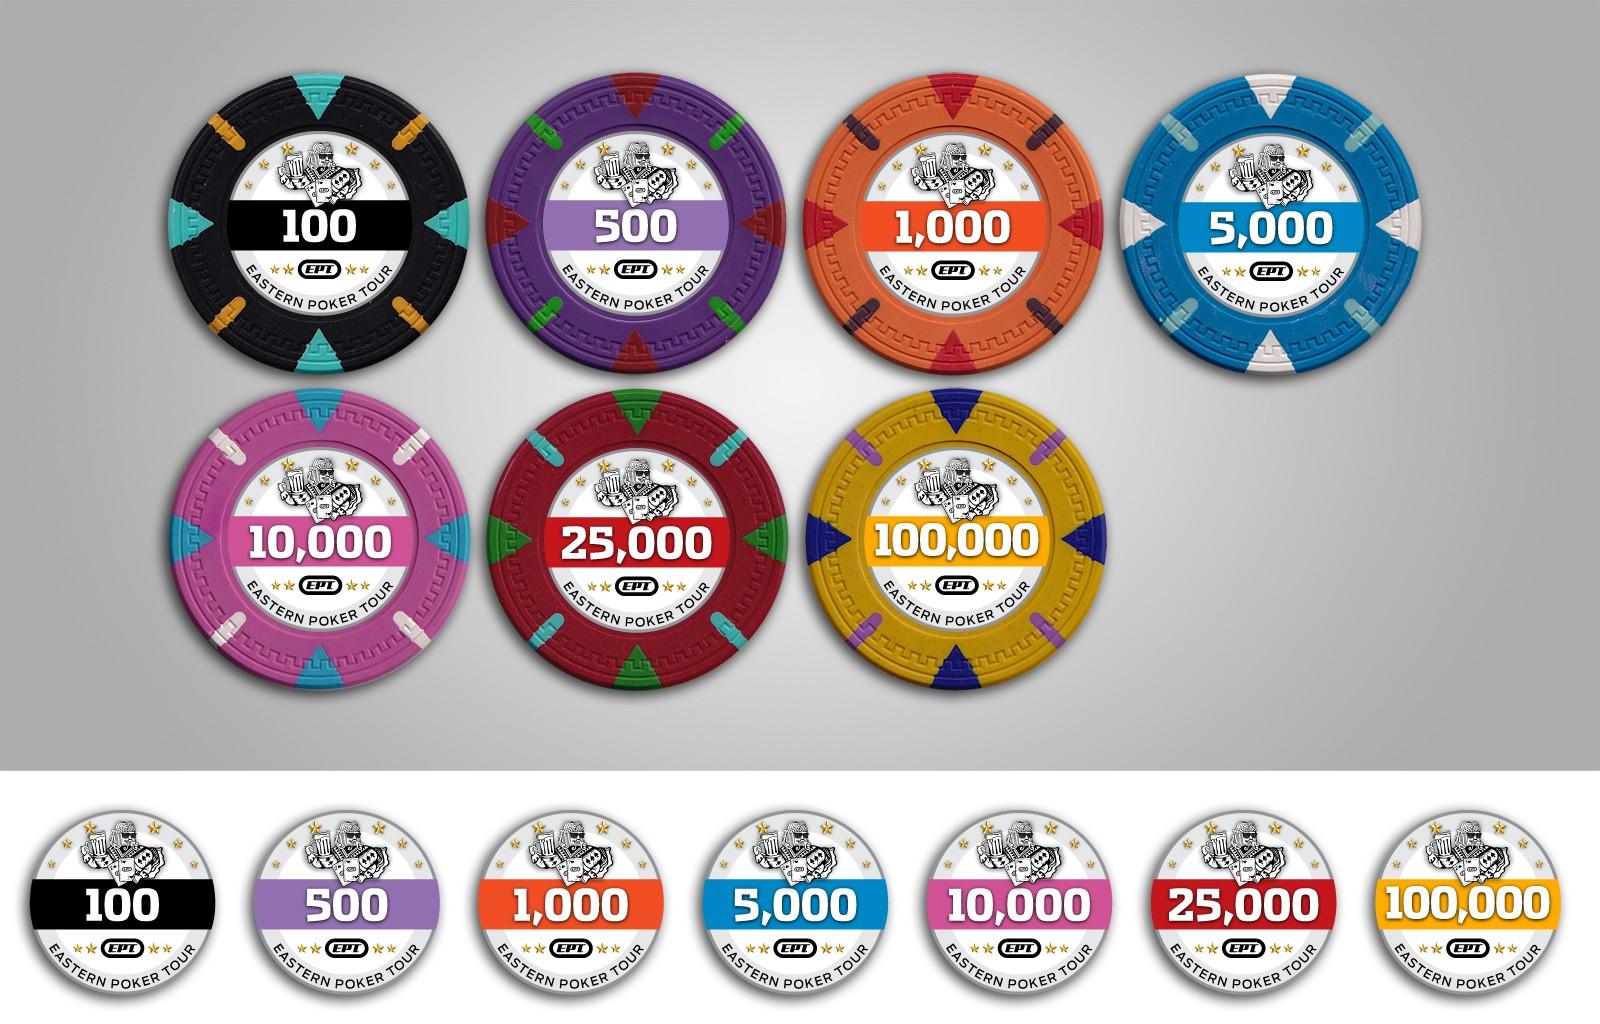 BAR POKER LEAGUE - Chip Design Contest!